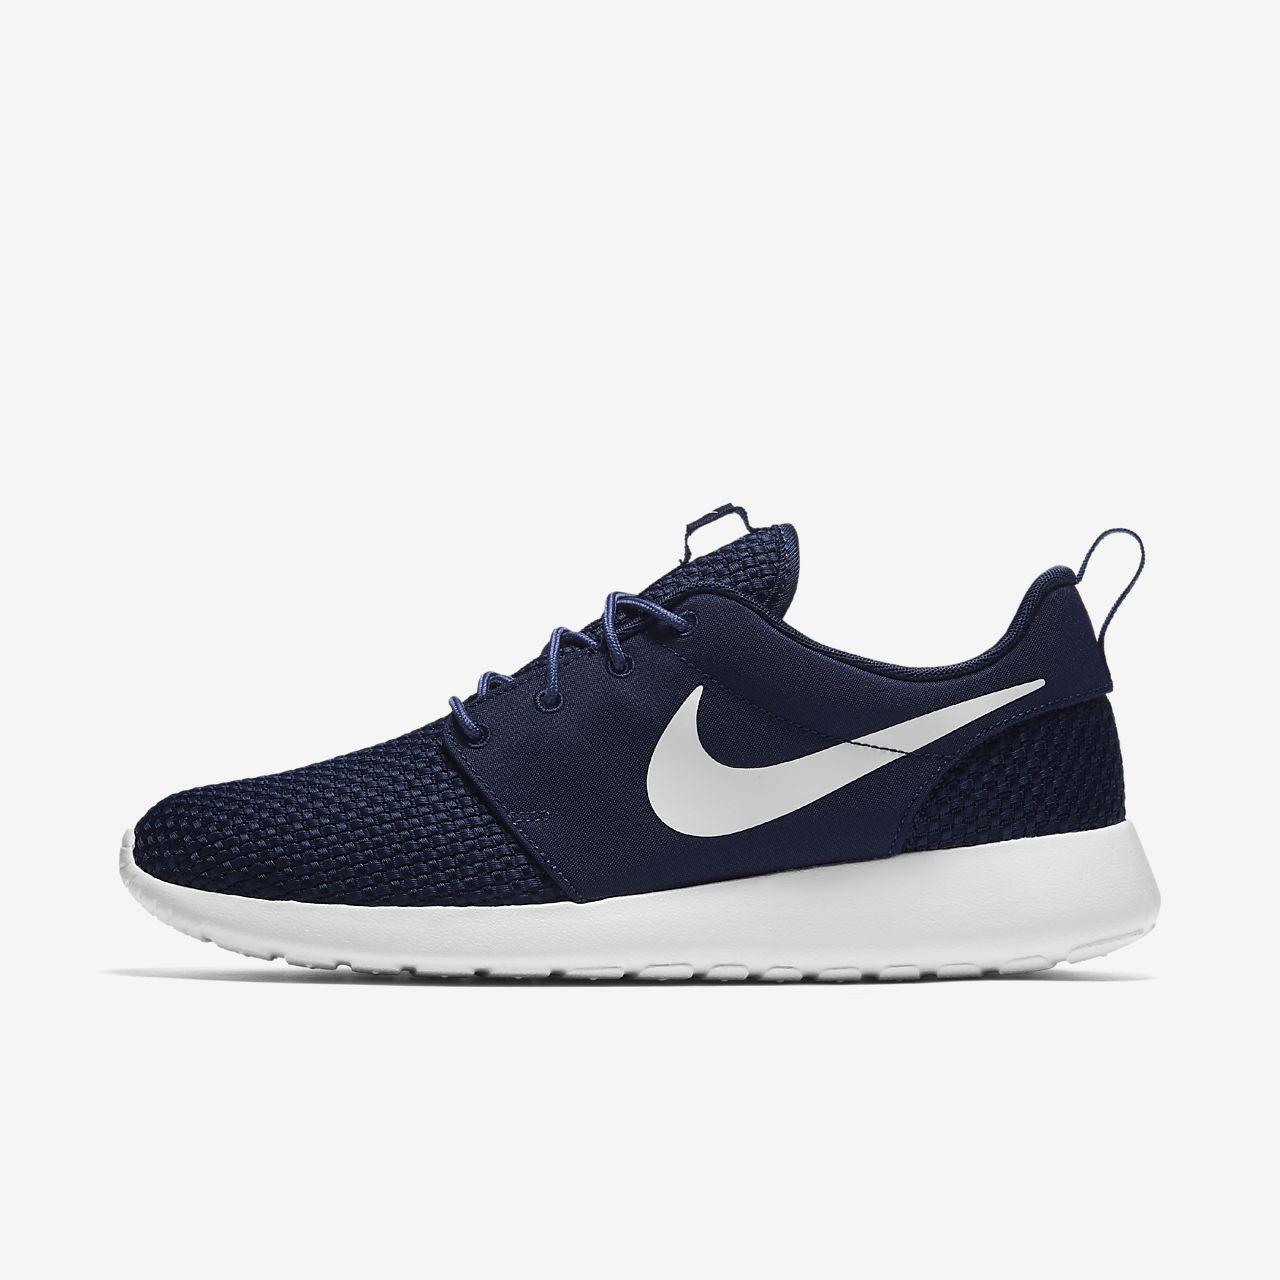 85fbe87aa19 Nike Roshe One SE Men s Shoe. Nike.com